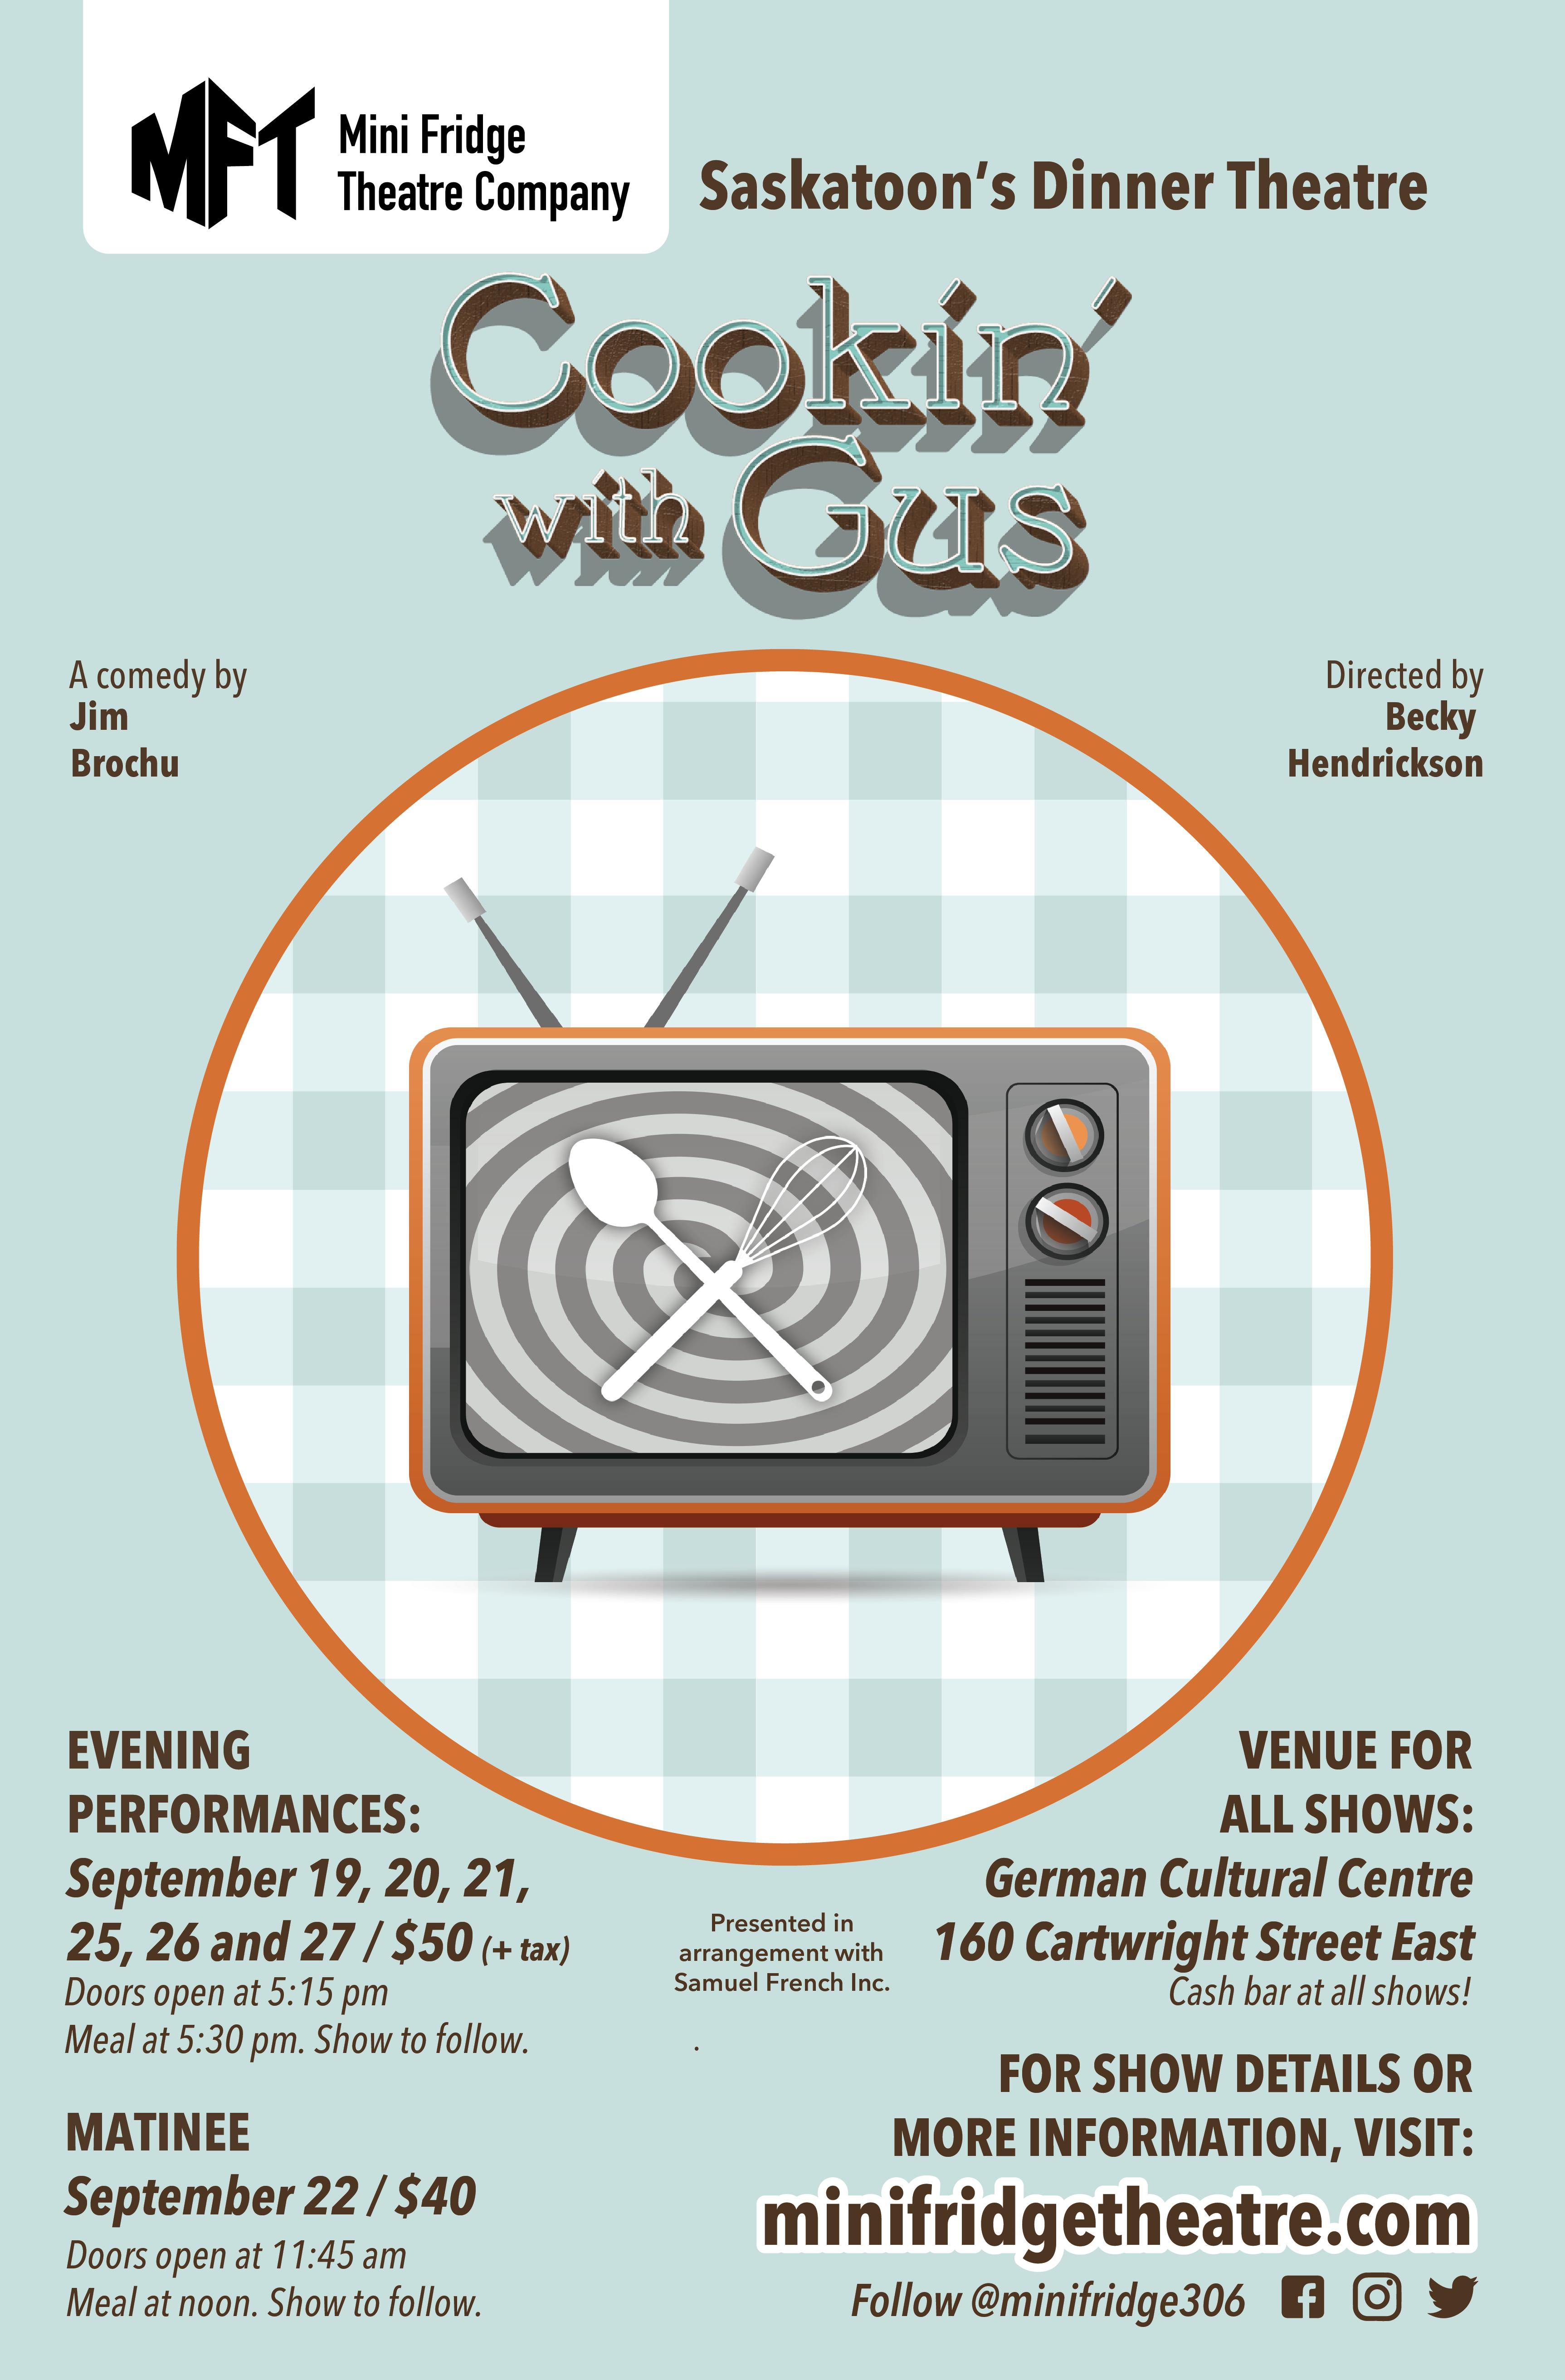 Gus web poster